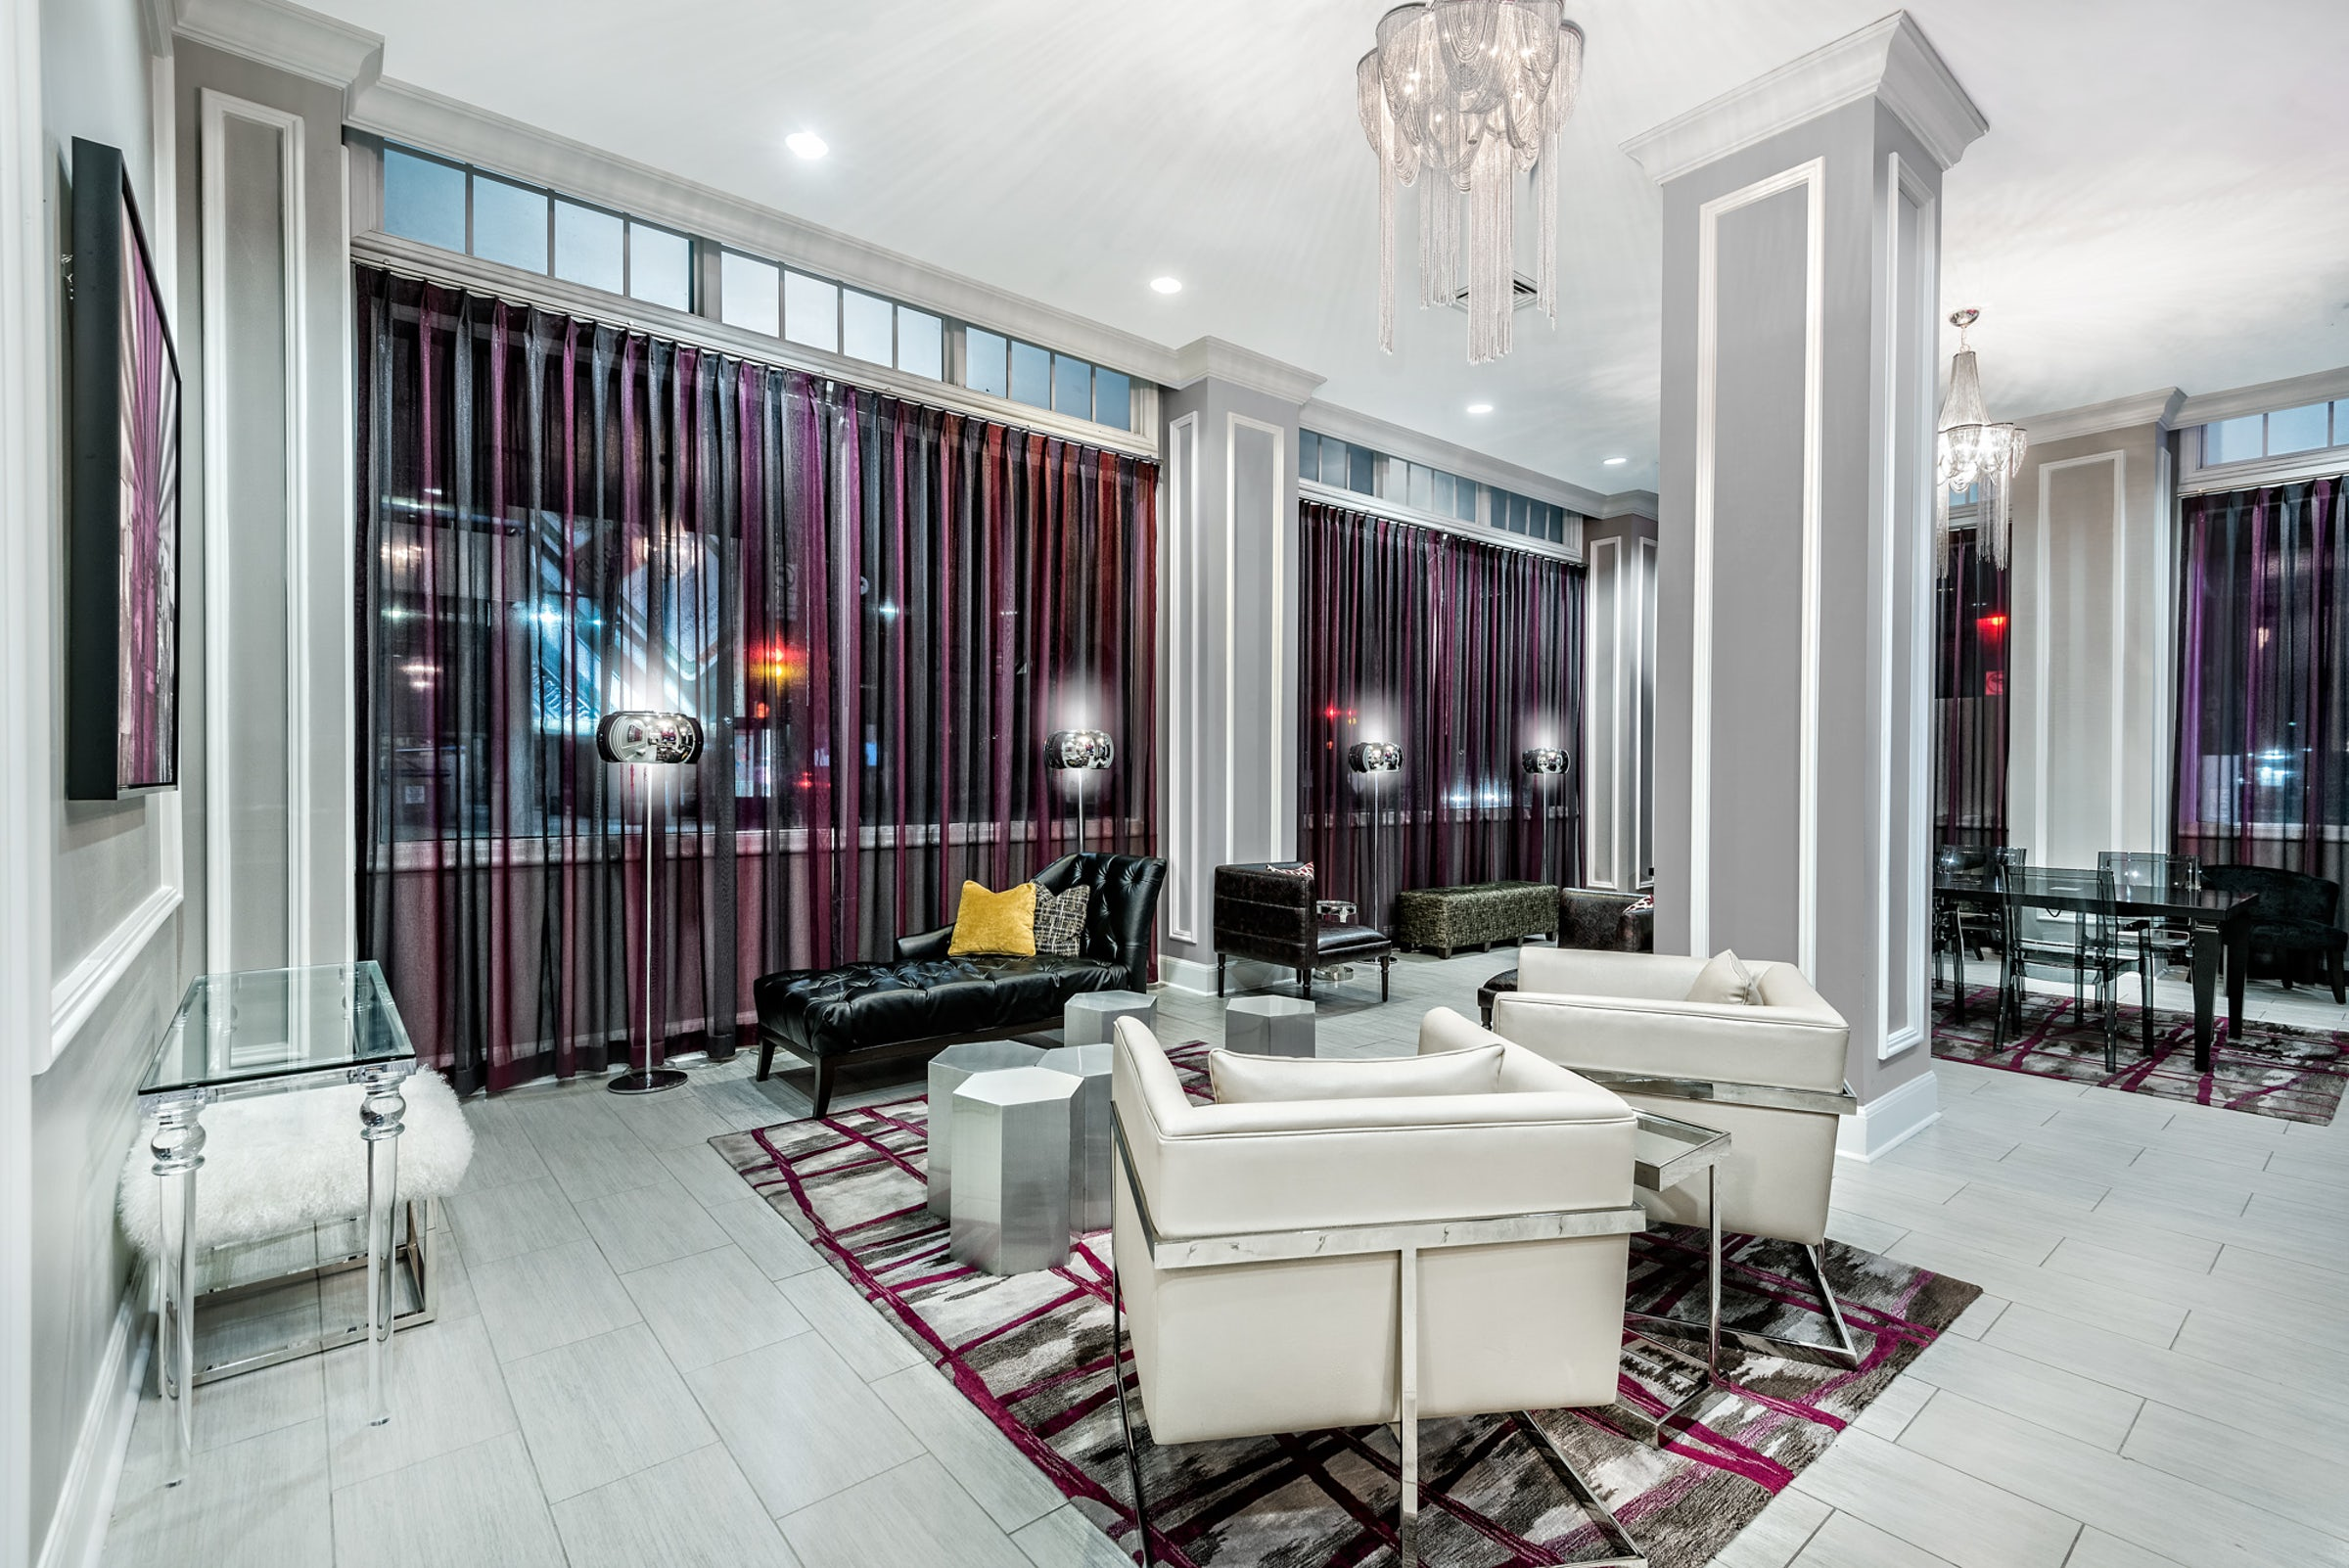 Hotel Indigo Dallas Downtown in Beyond Dallas